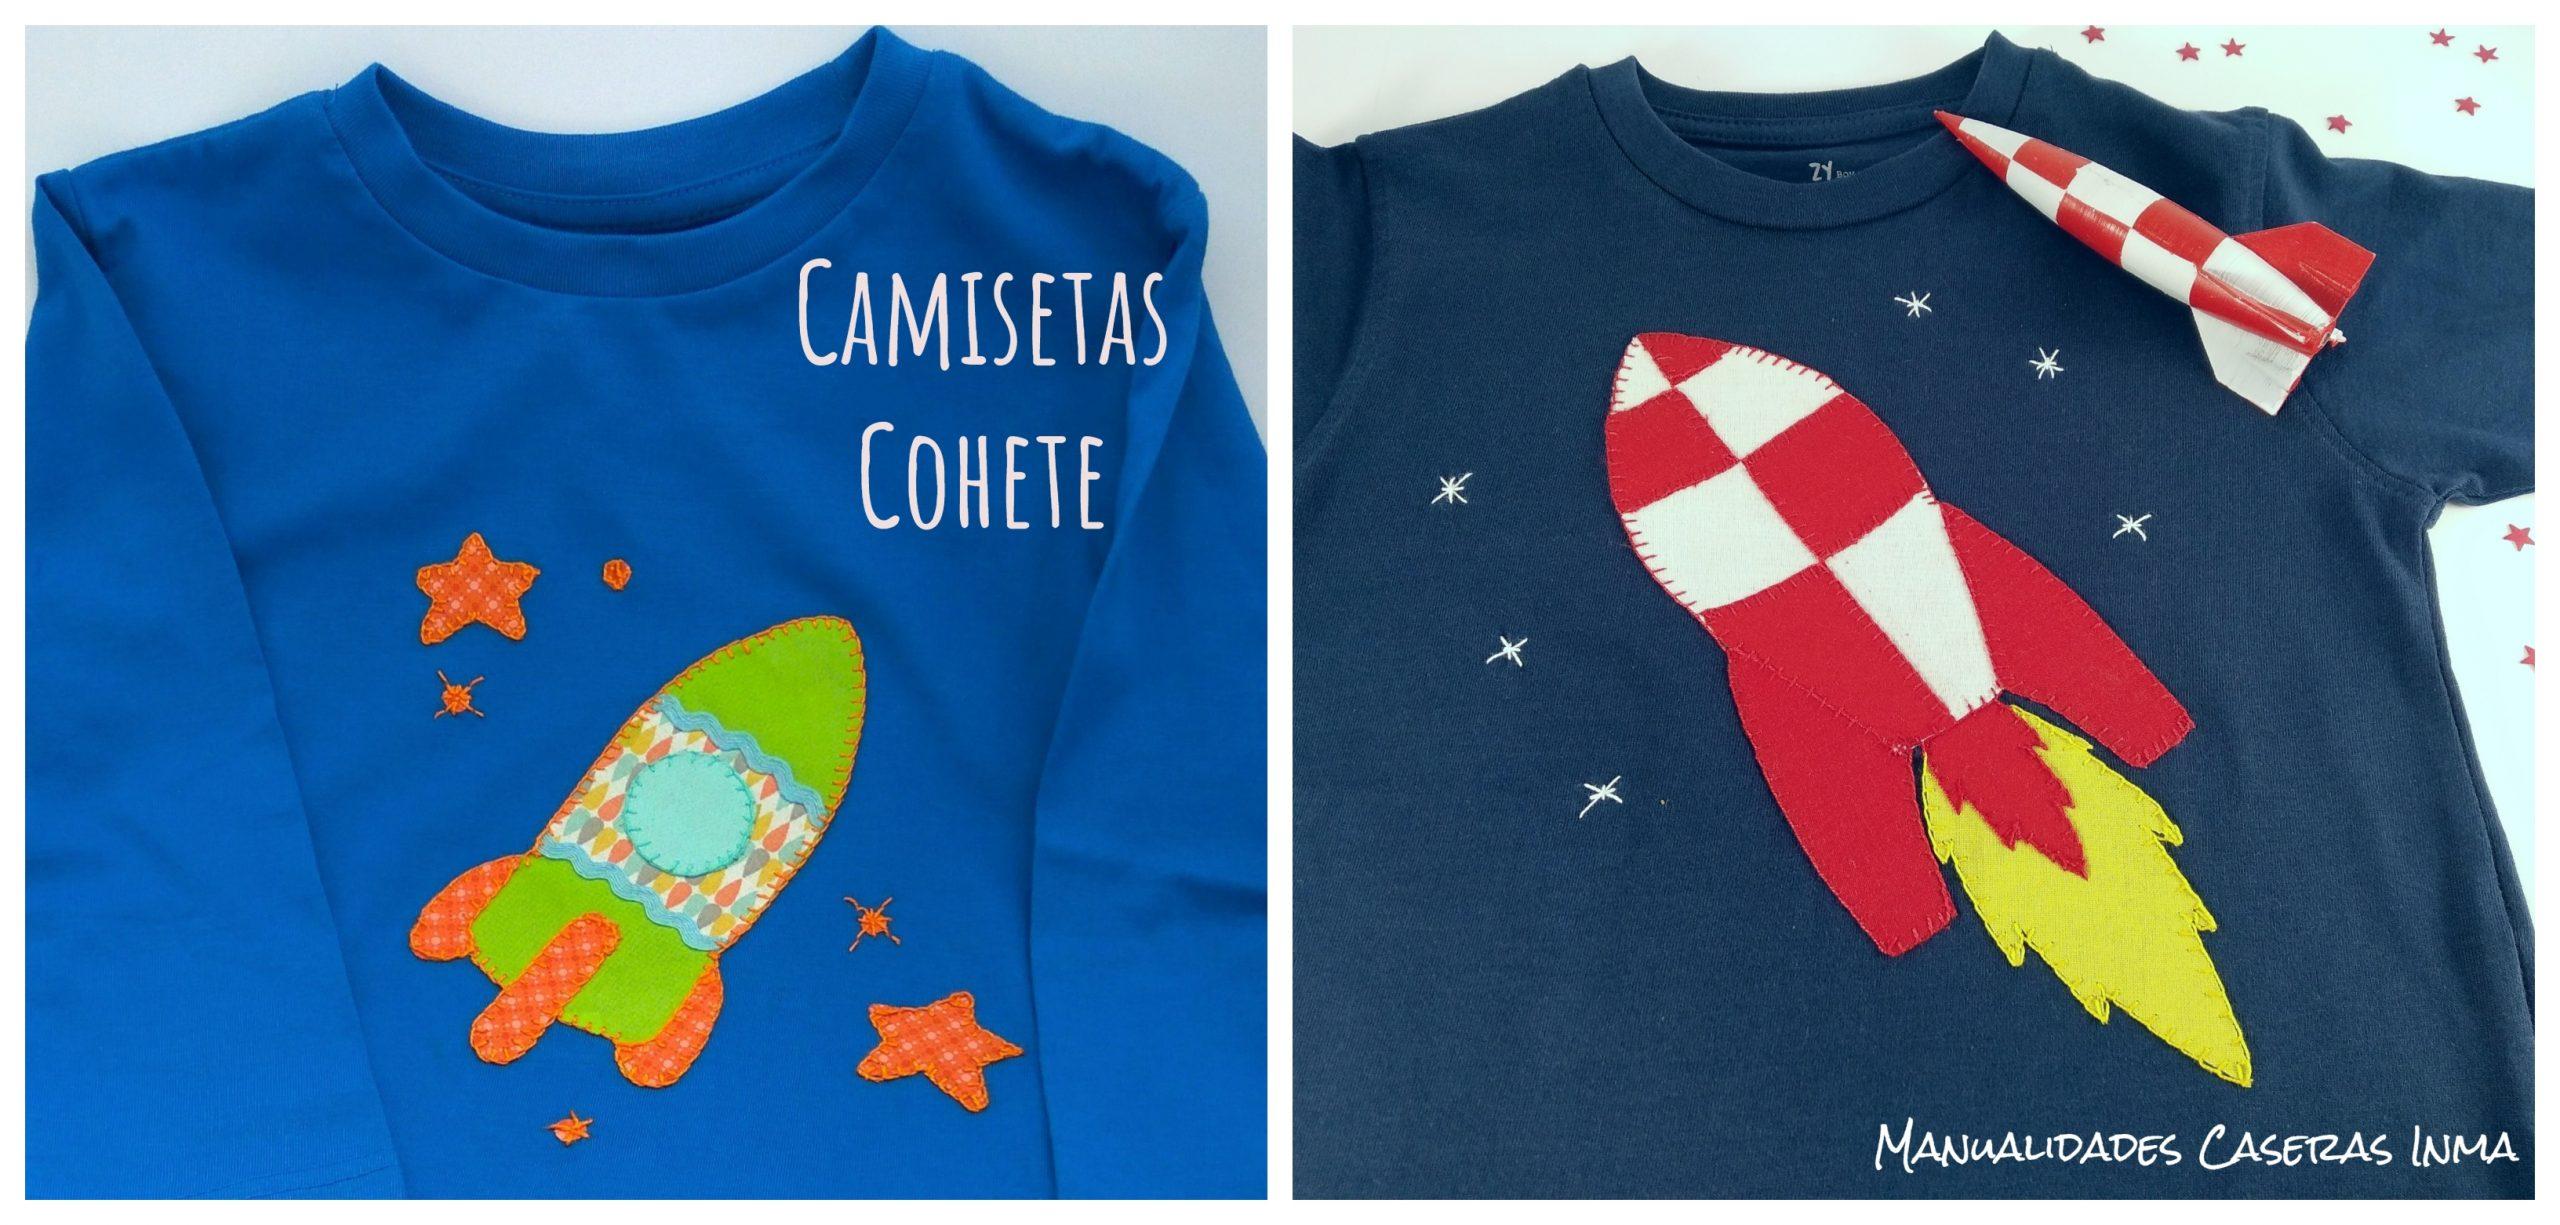 Manualidades Caseras Inma_ Camiseta cohete